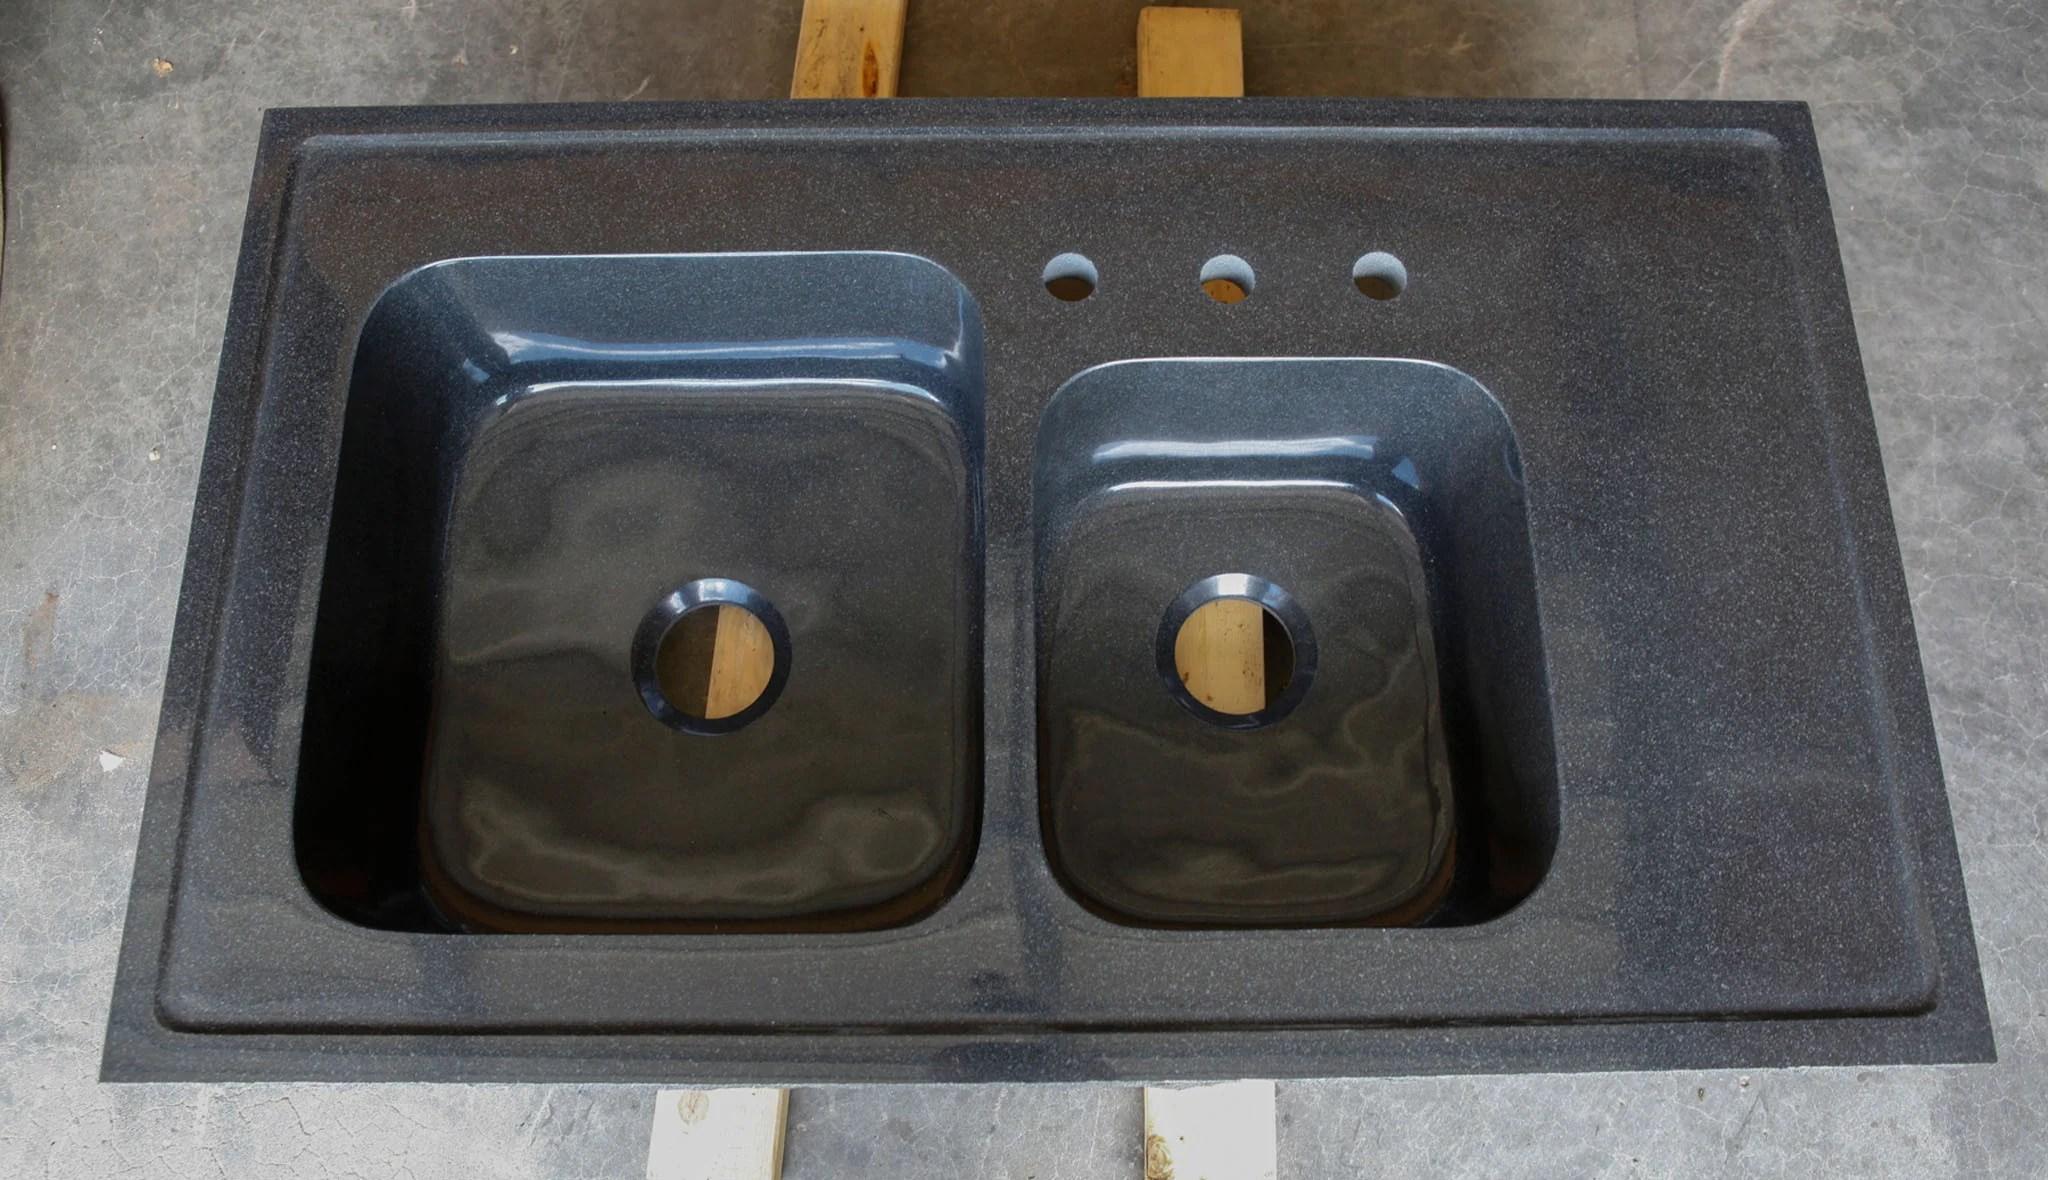 Stone Forest Seconds Custom Double Basin Kitchen Sink Black Granite1 f8d74a50 ae20 4c6b 8710 b2704780e801